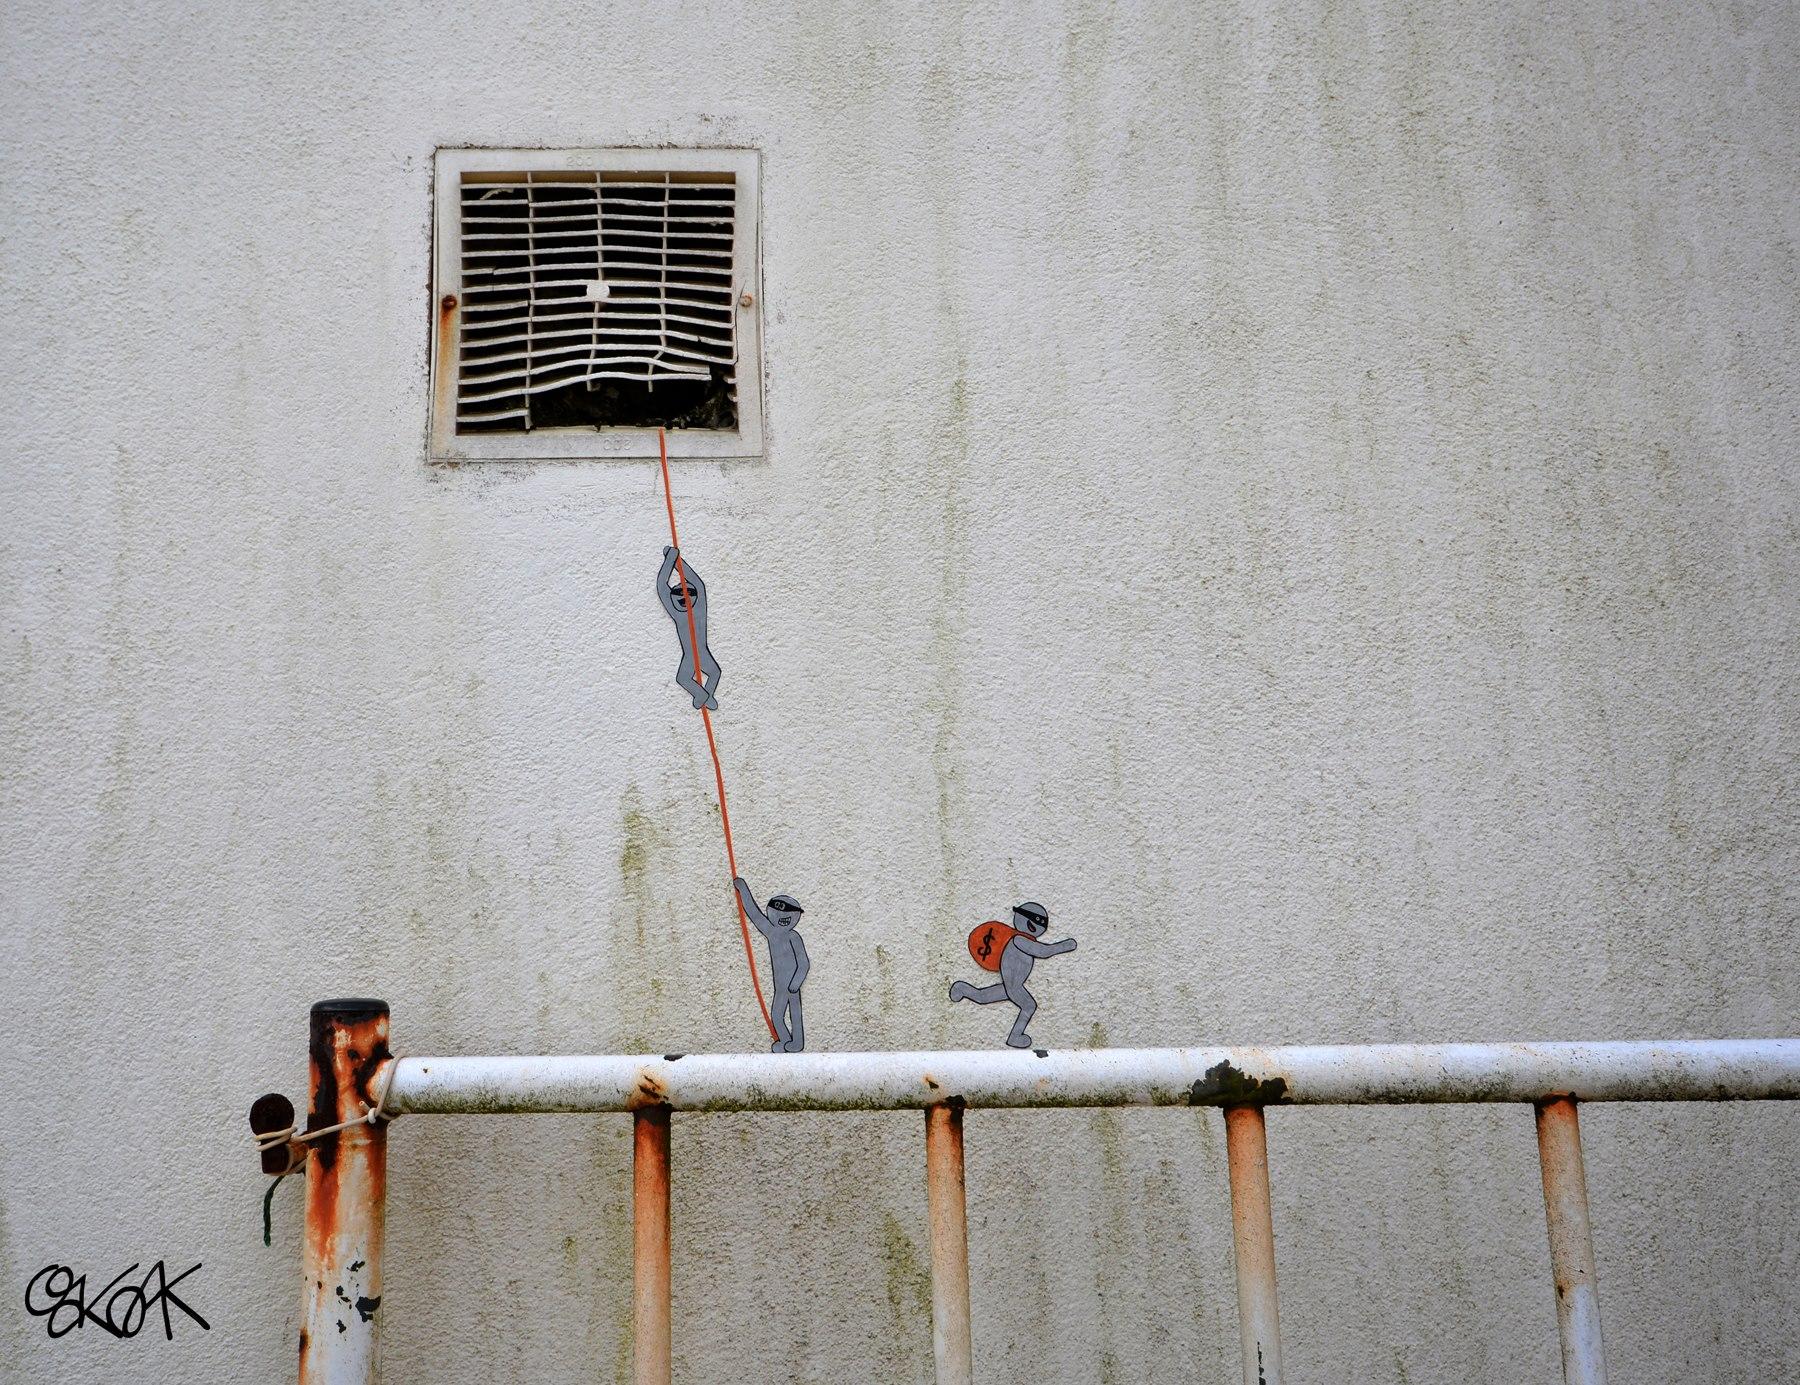 cool-street-art-from-paris-oak-oak-part2-20